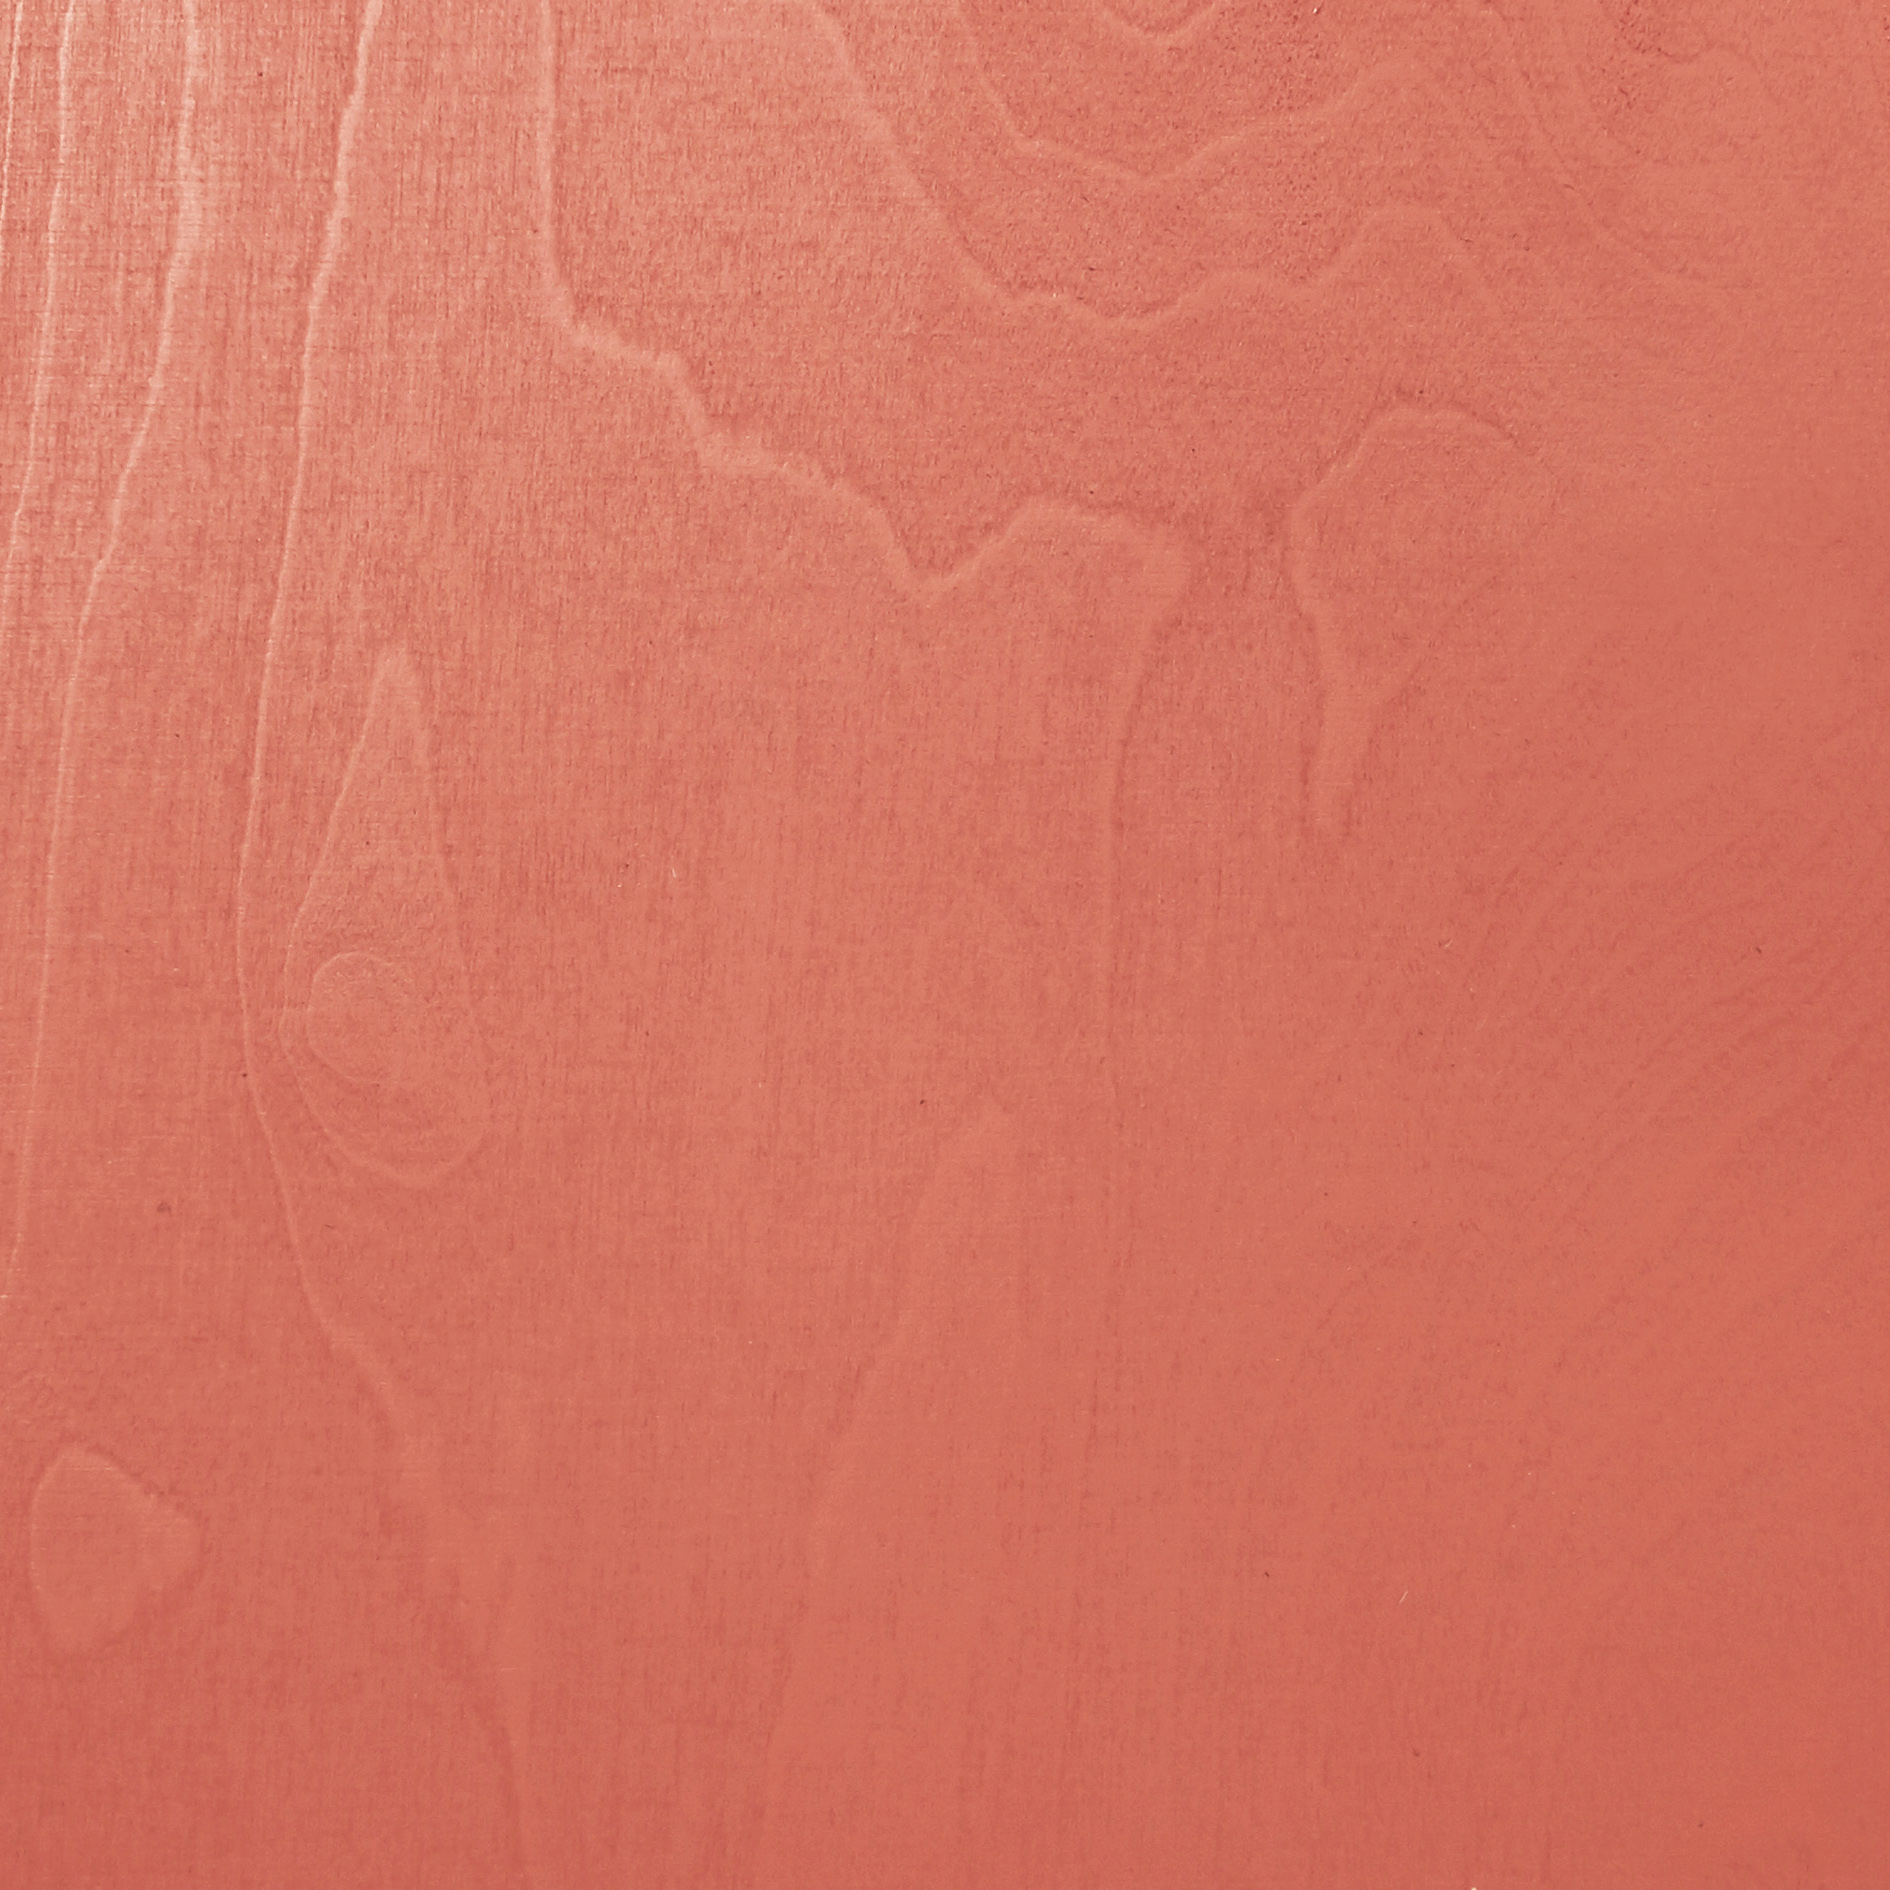 SoWatt-Loft-Plywood-Material-Swatch-Blush-Pink.jpg